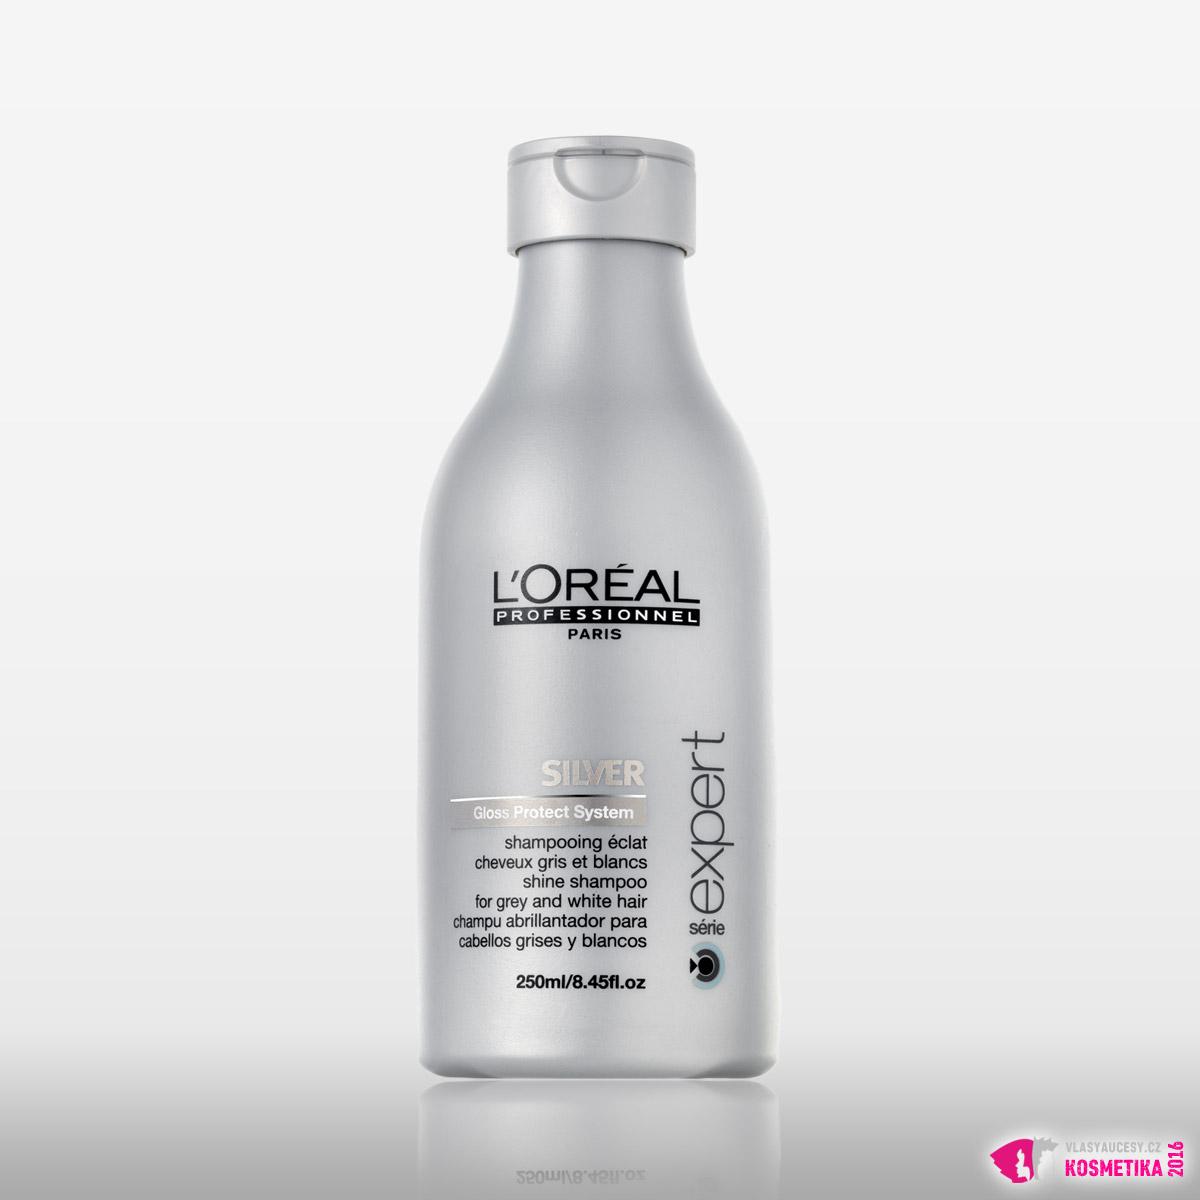 Stříbrný šampon L'Oréal Professionnel – Silver.